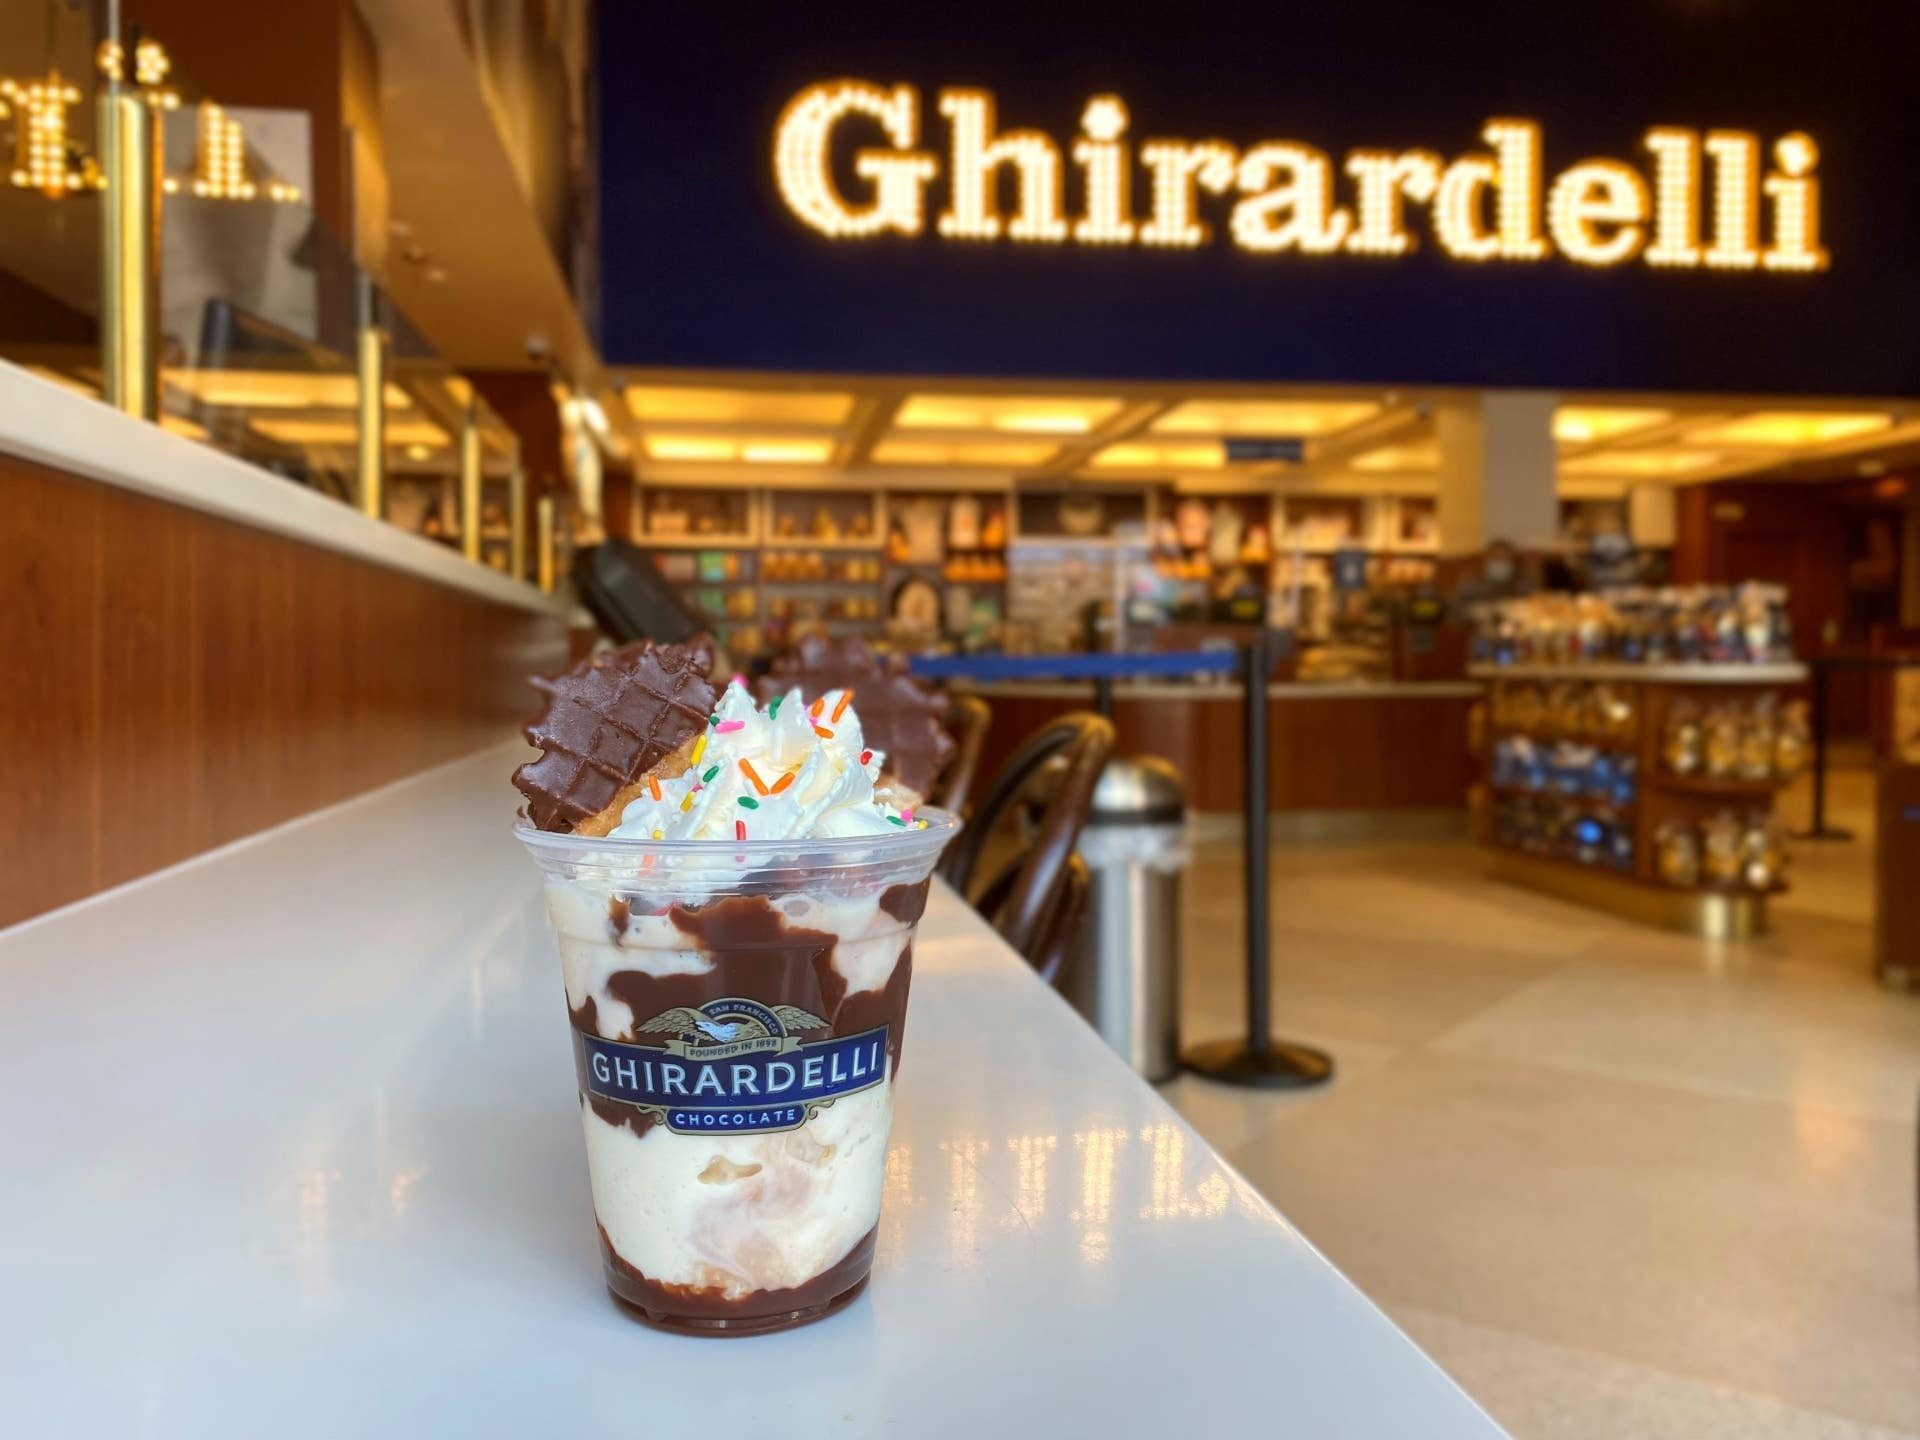 Magical Sundae at Ghirardelli Soda Fountain & Chocolate Shop in Hollywood